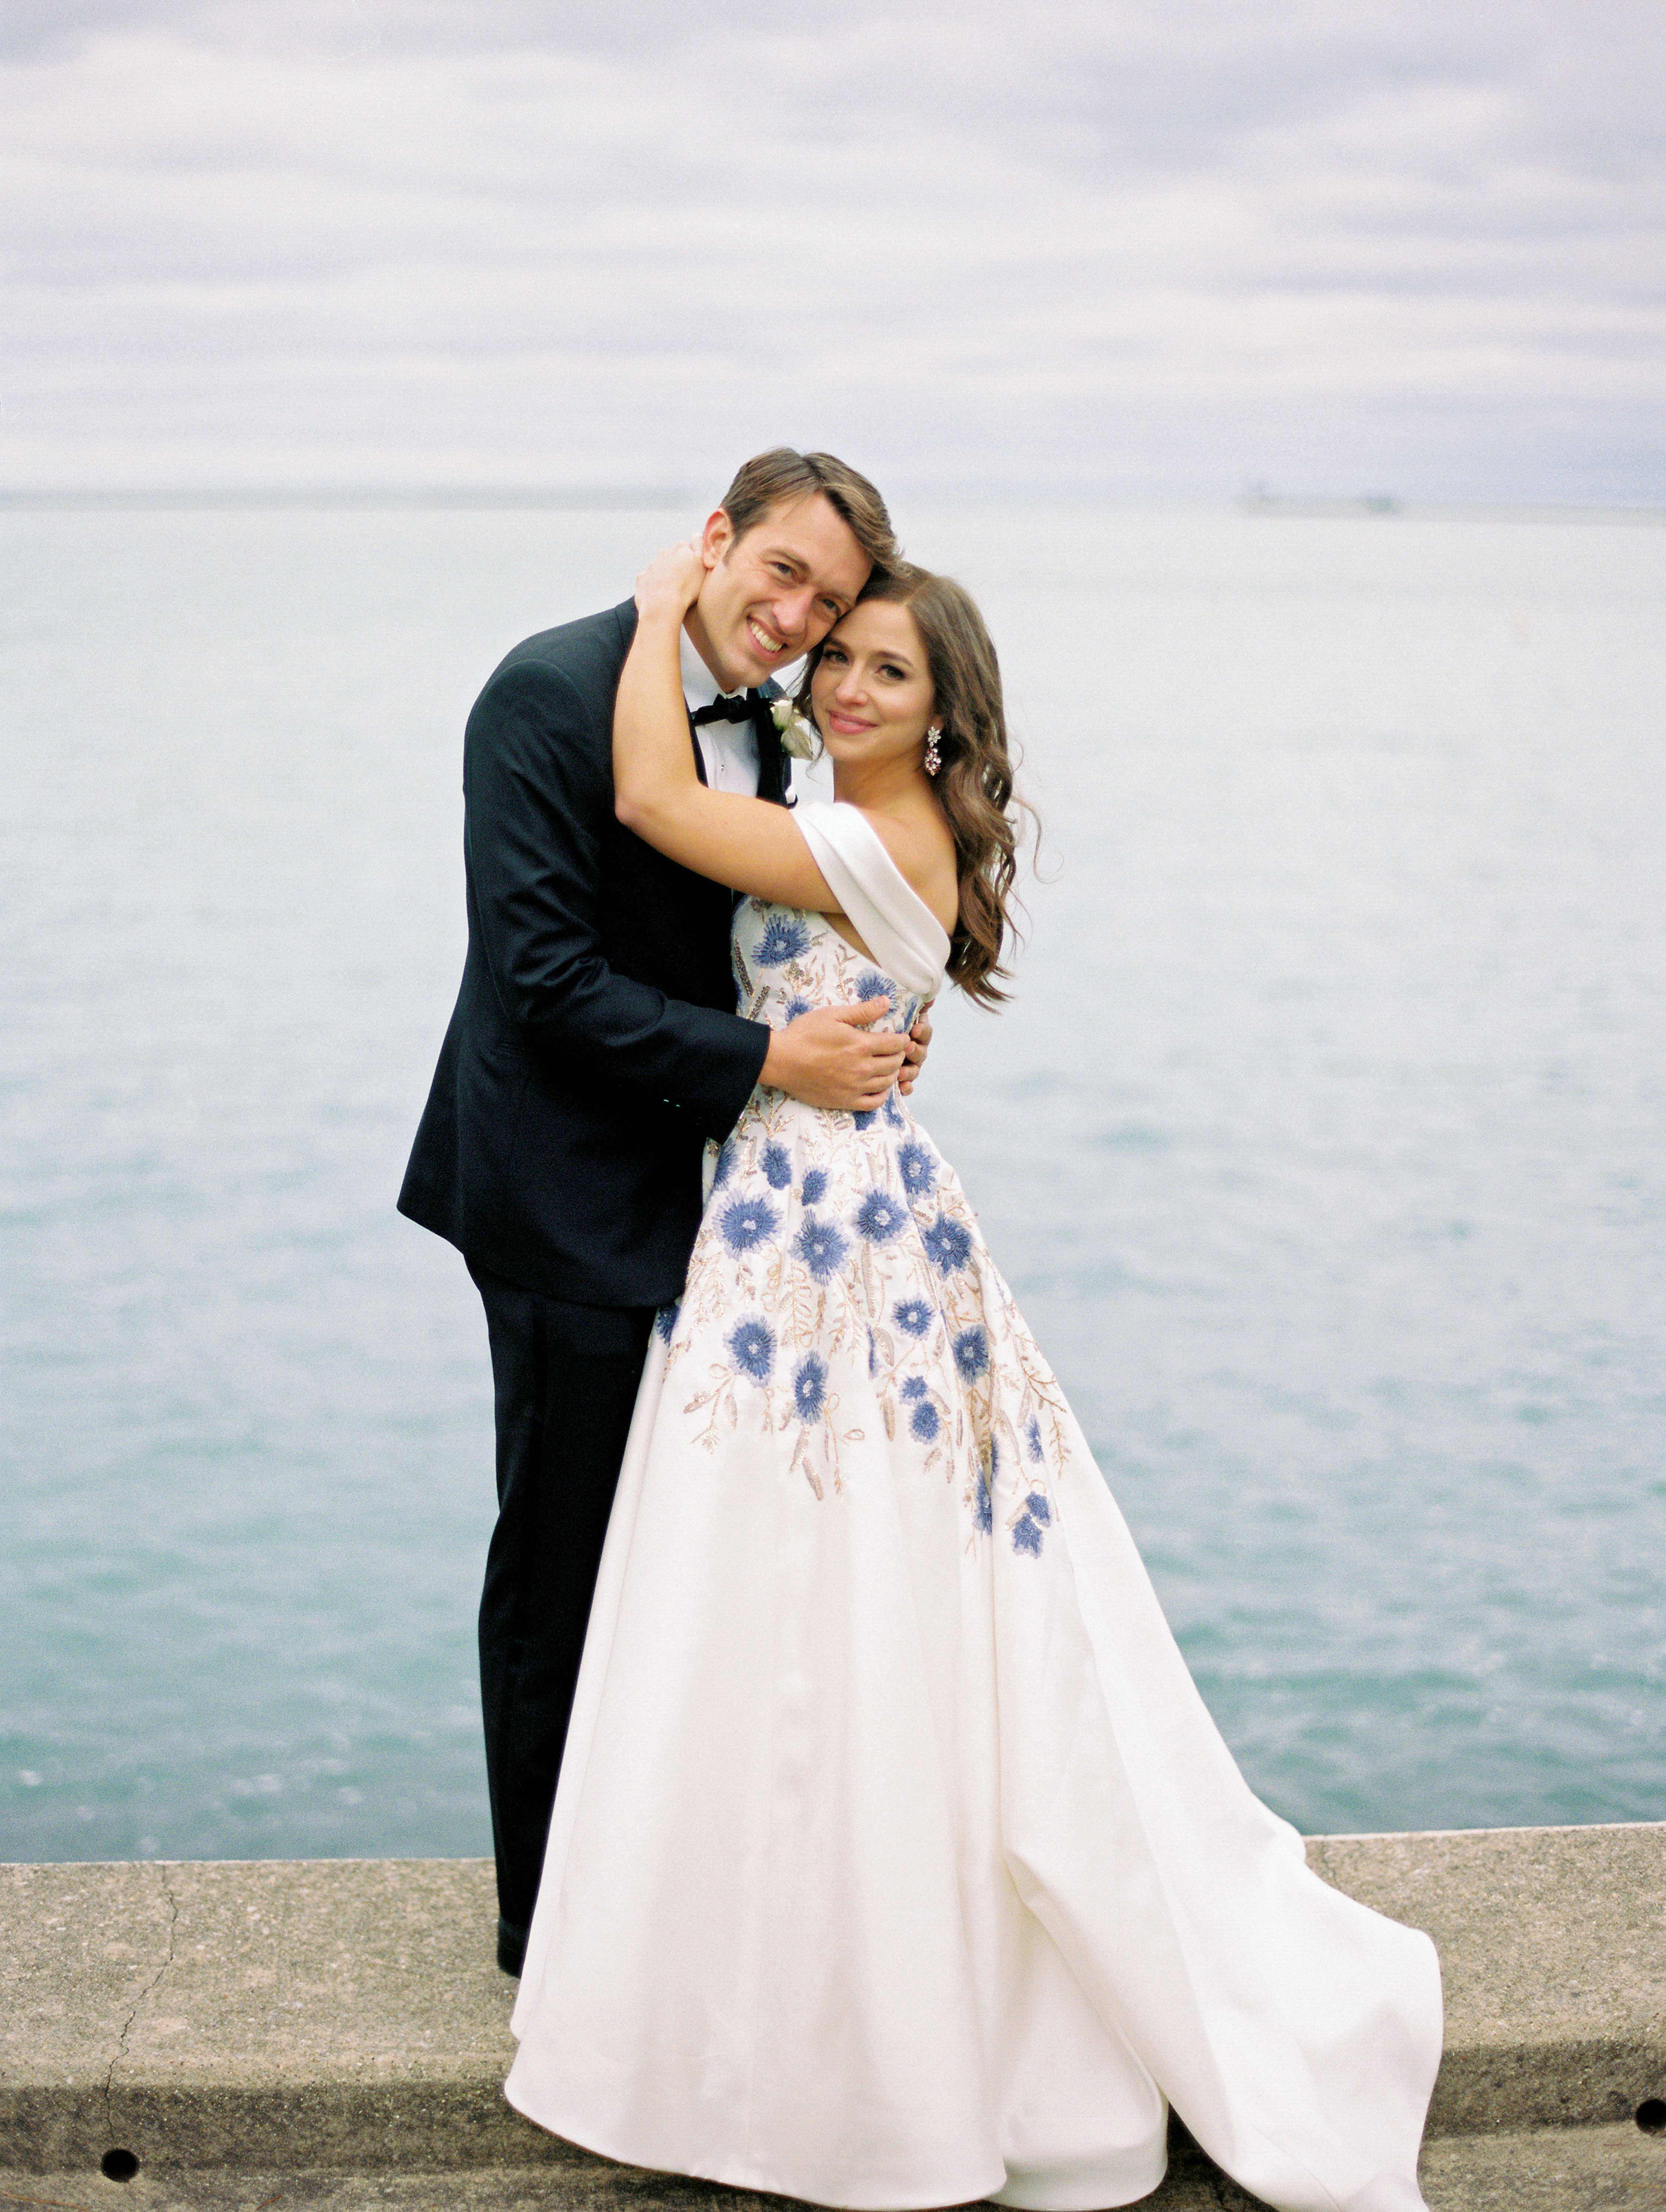 kori paul wedding couple embrace